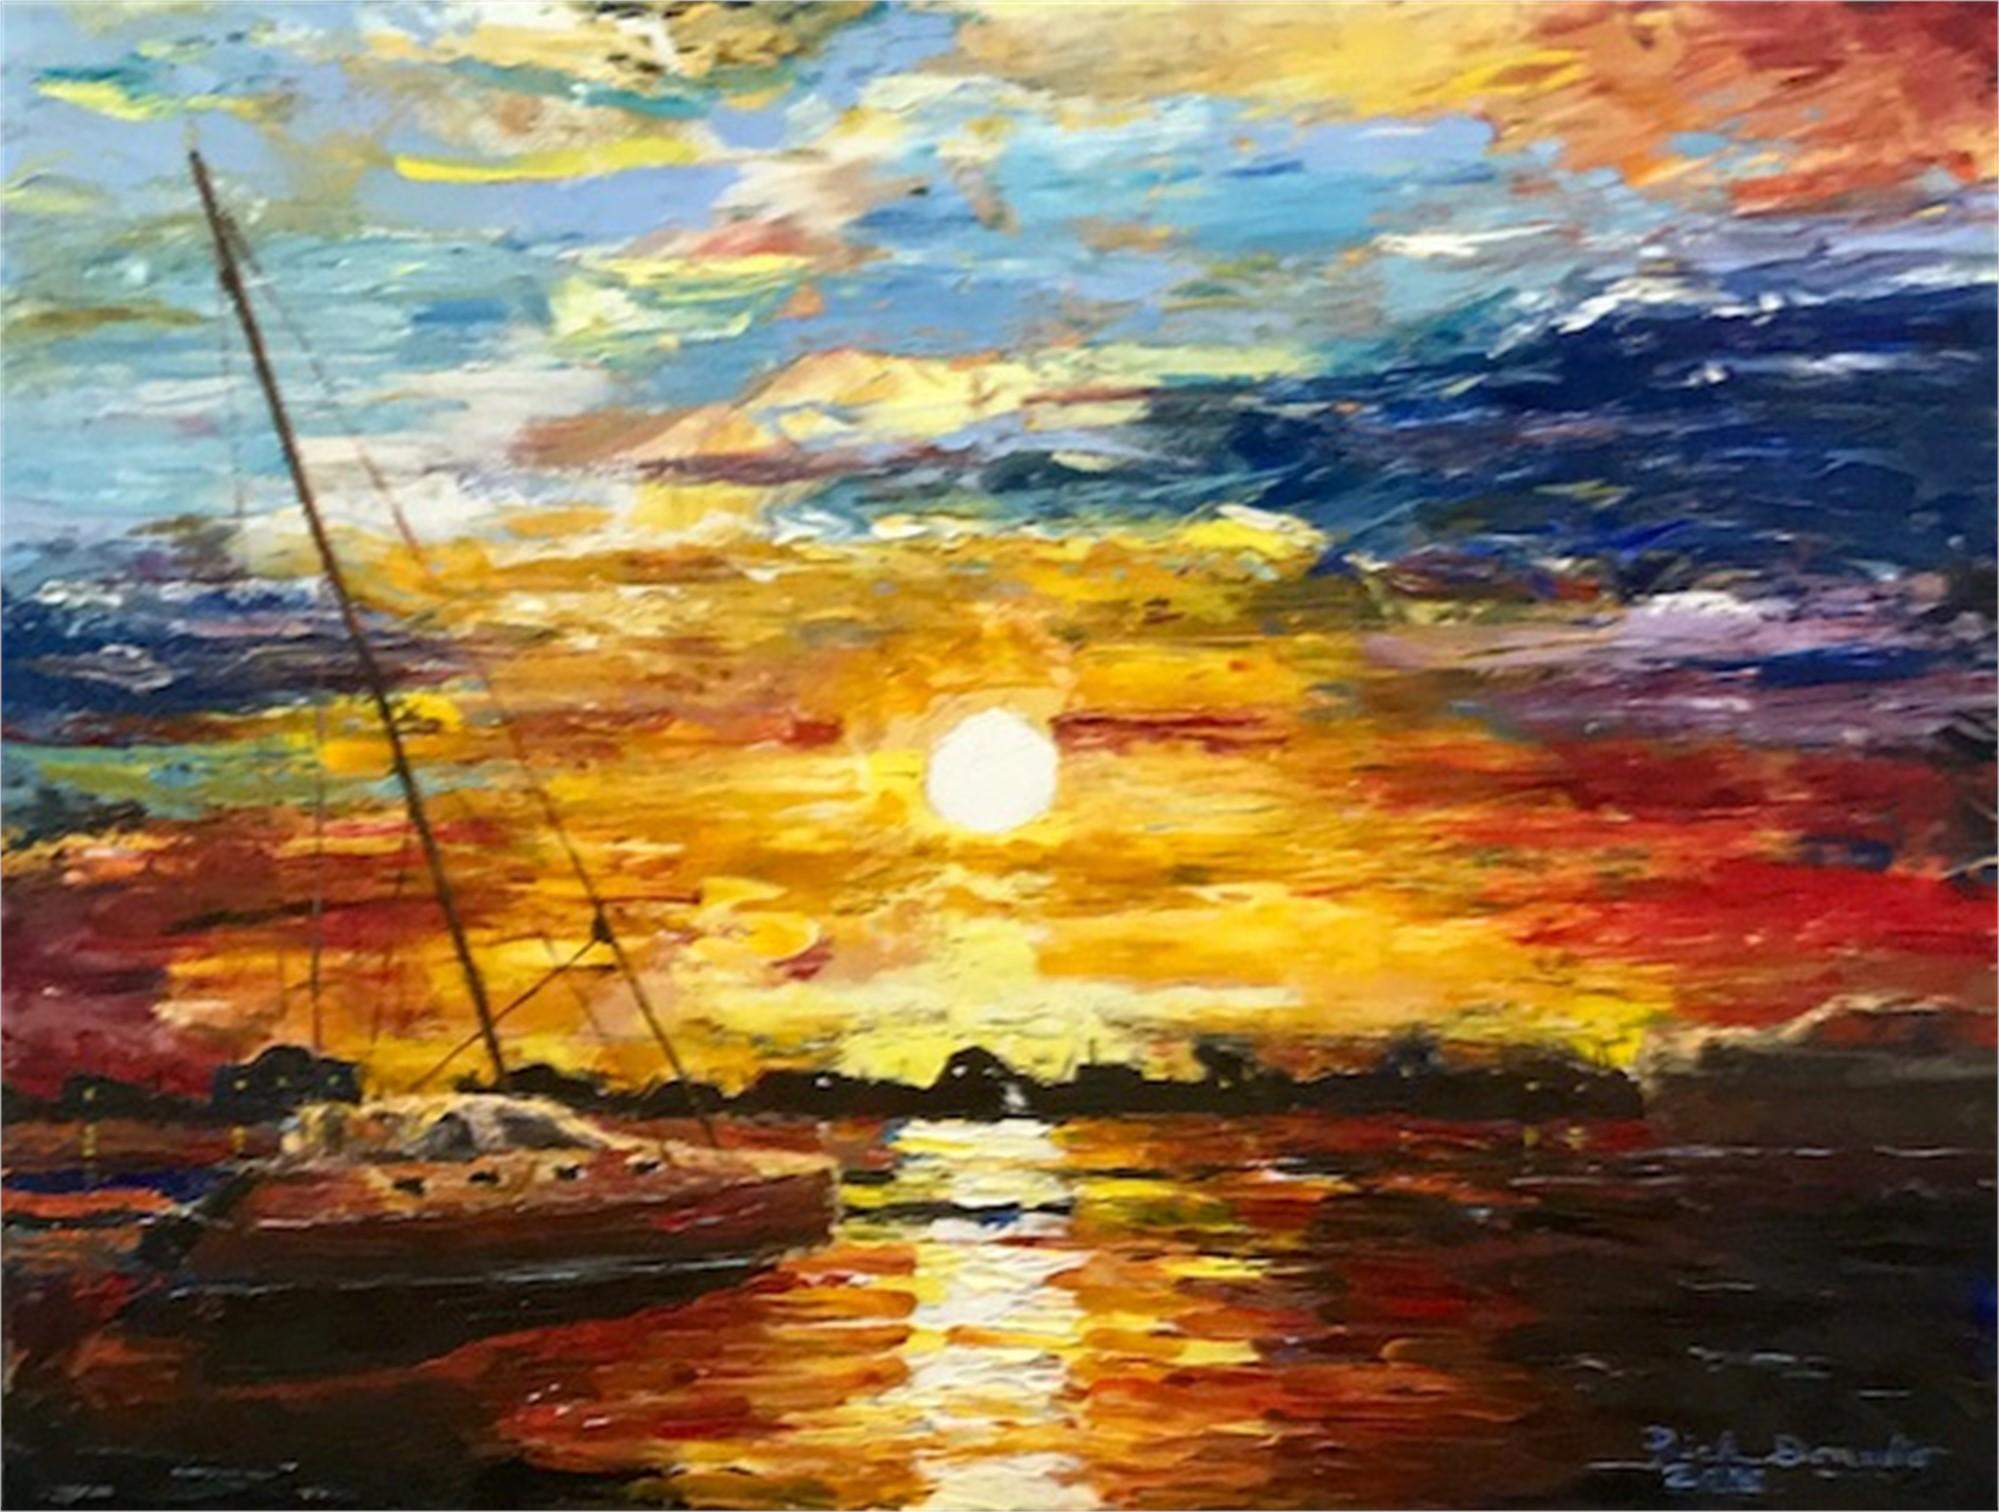 Sunset Over Charlston Harbor, 2018 by Richard Donadio